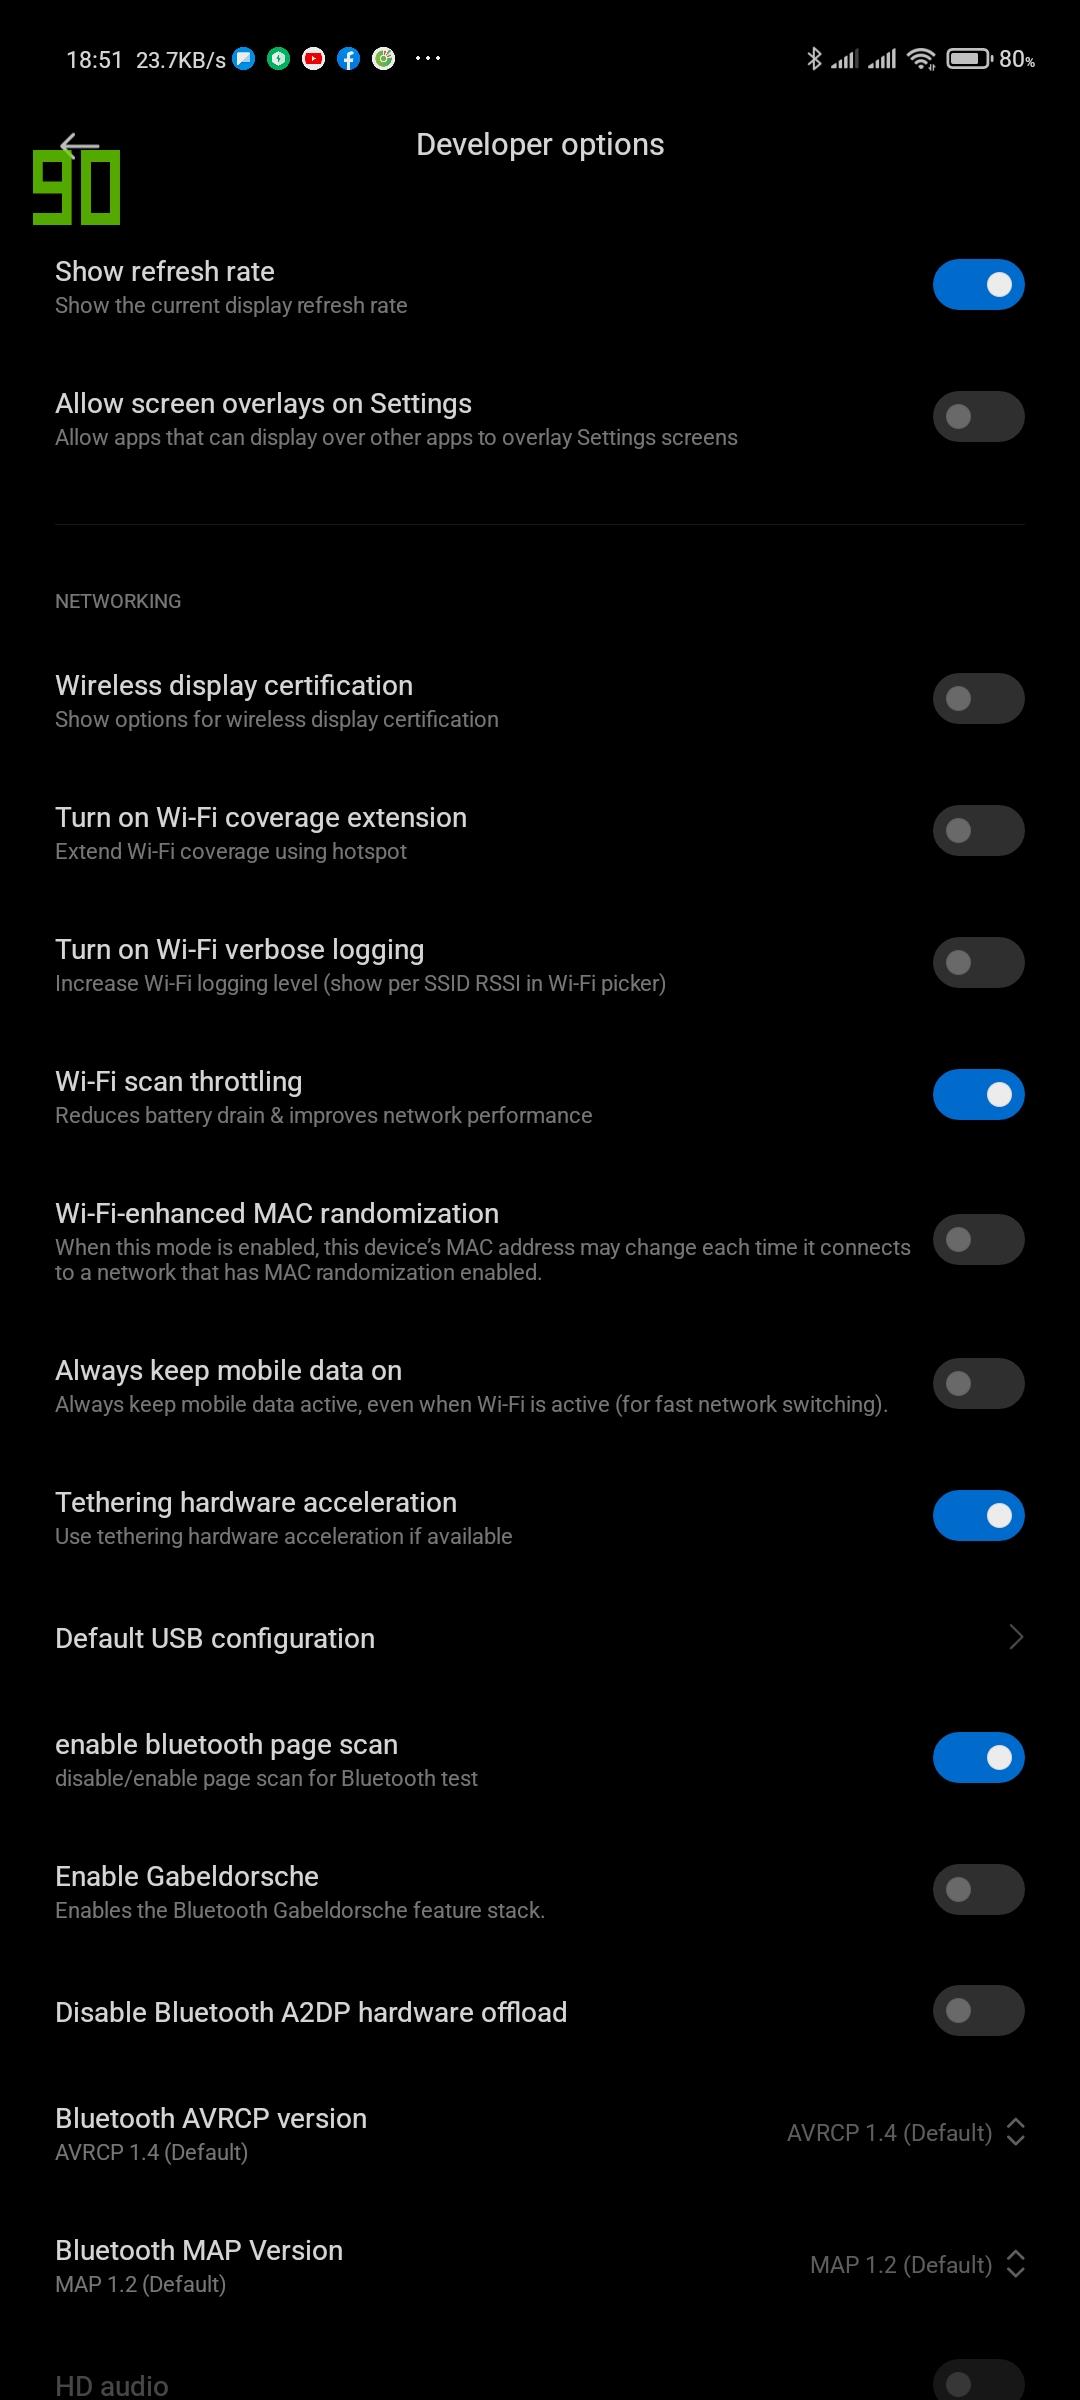 Screenshot_2021-04-29-18-51-39-914_com.android.settings.jpg